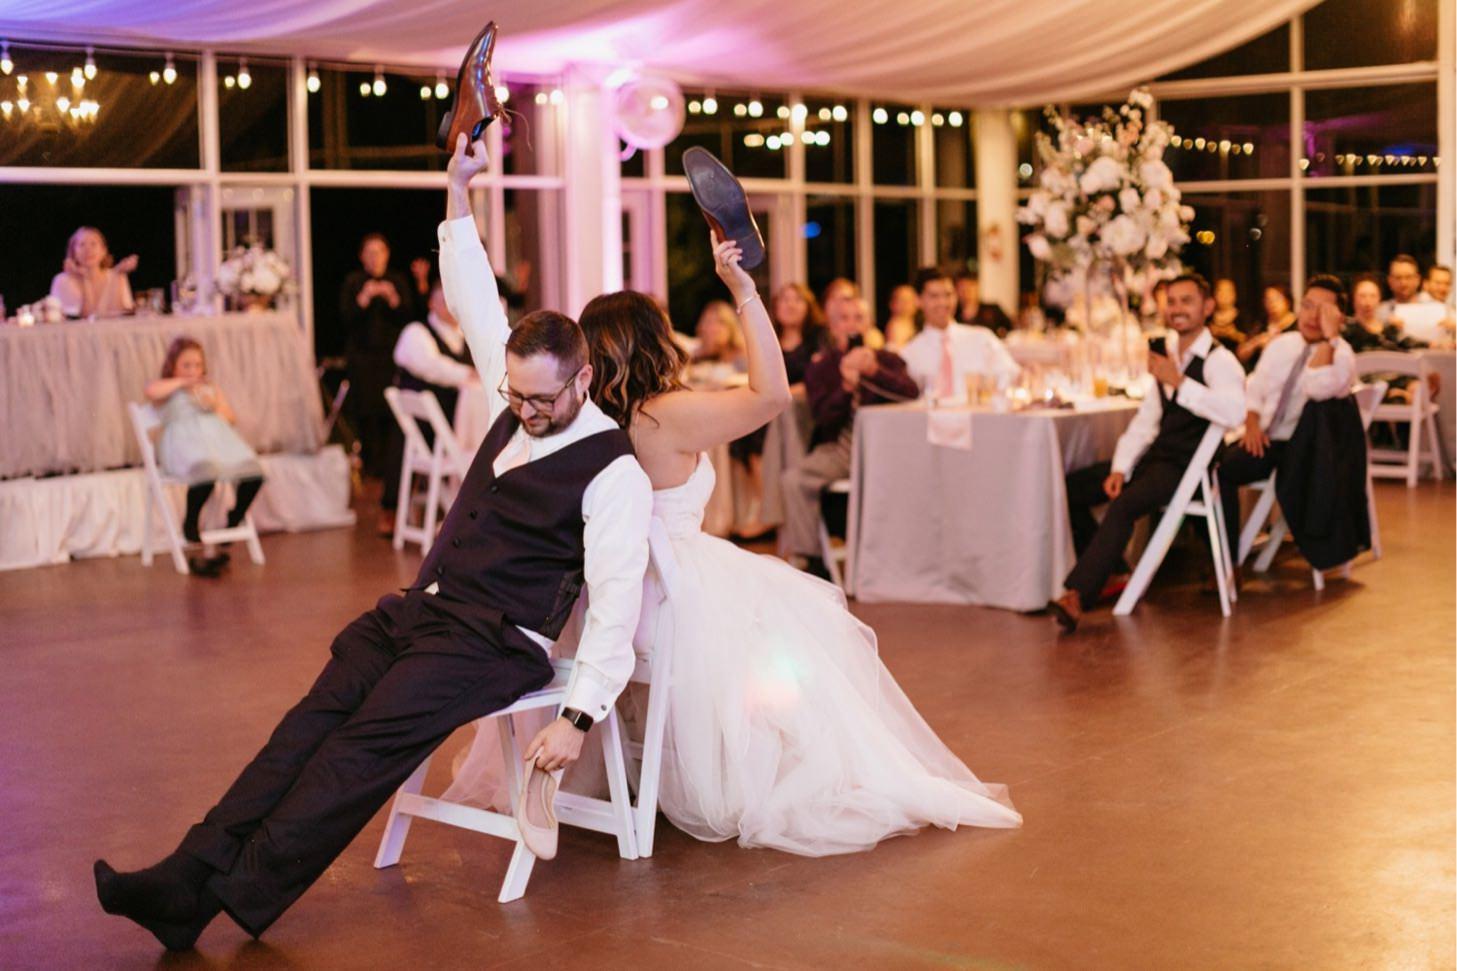 ritz-charles-wedding-reception-downtown-indianapolis-wedding-photographer069.JPG